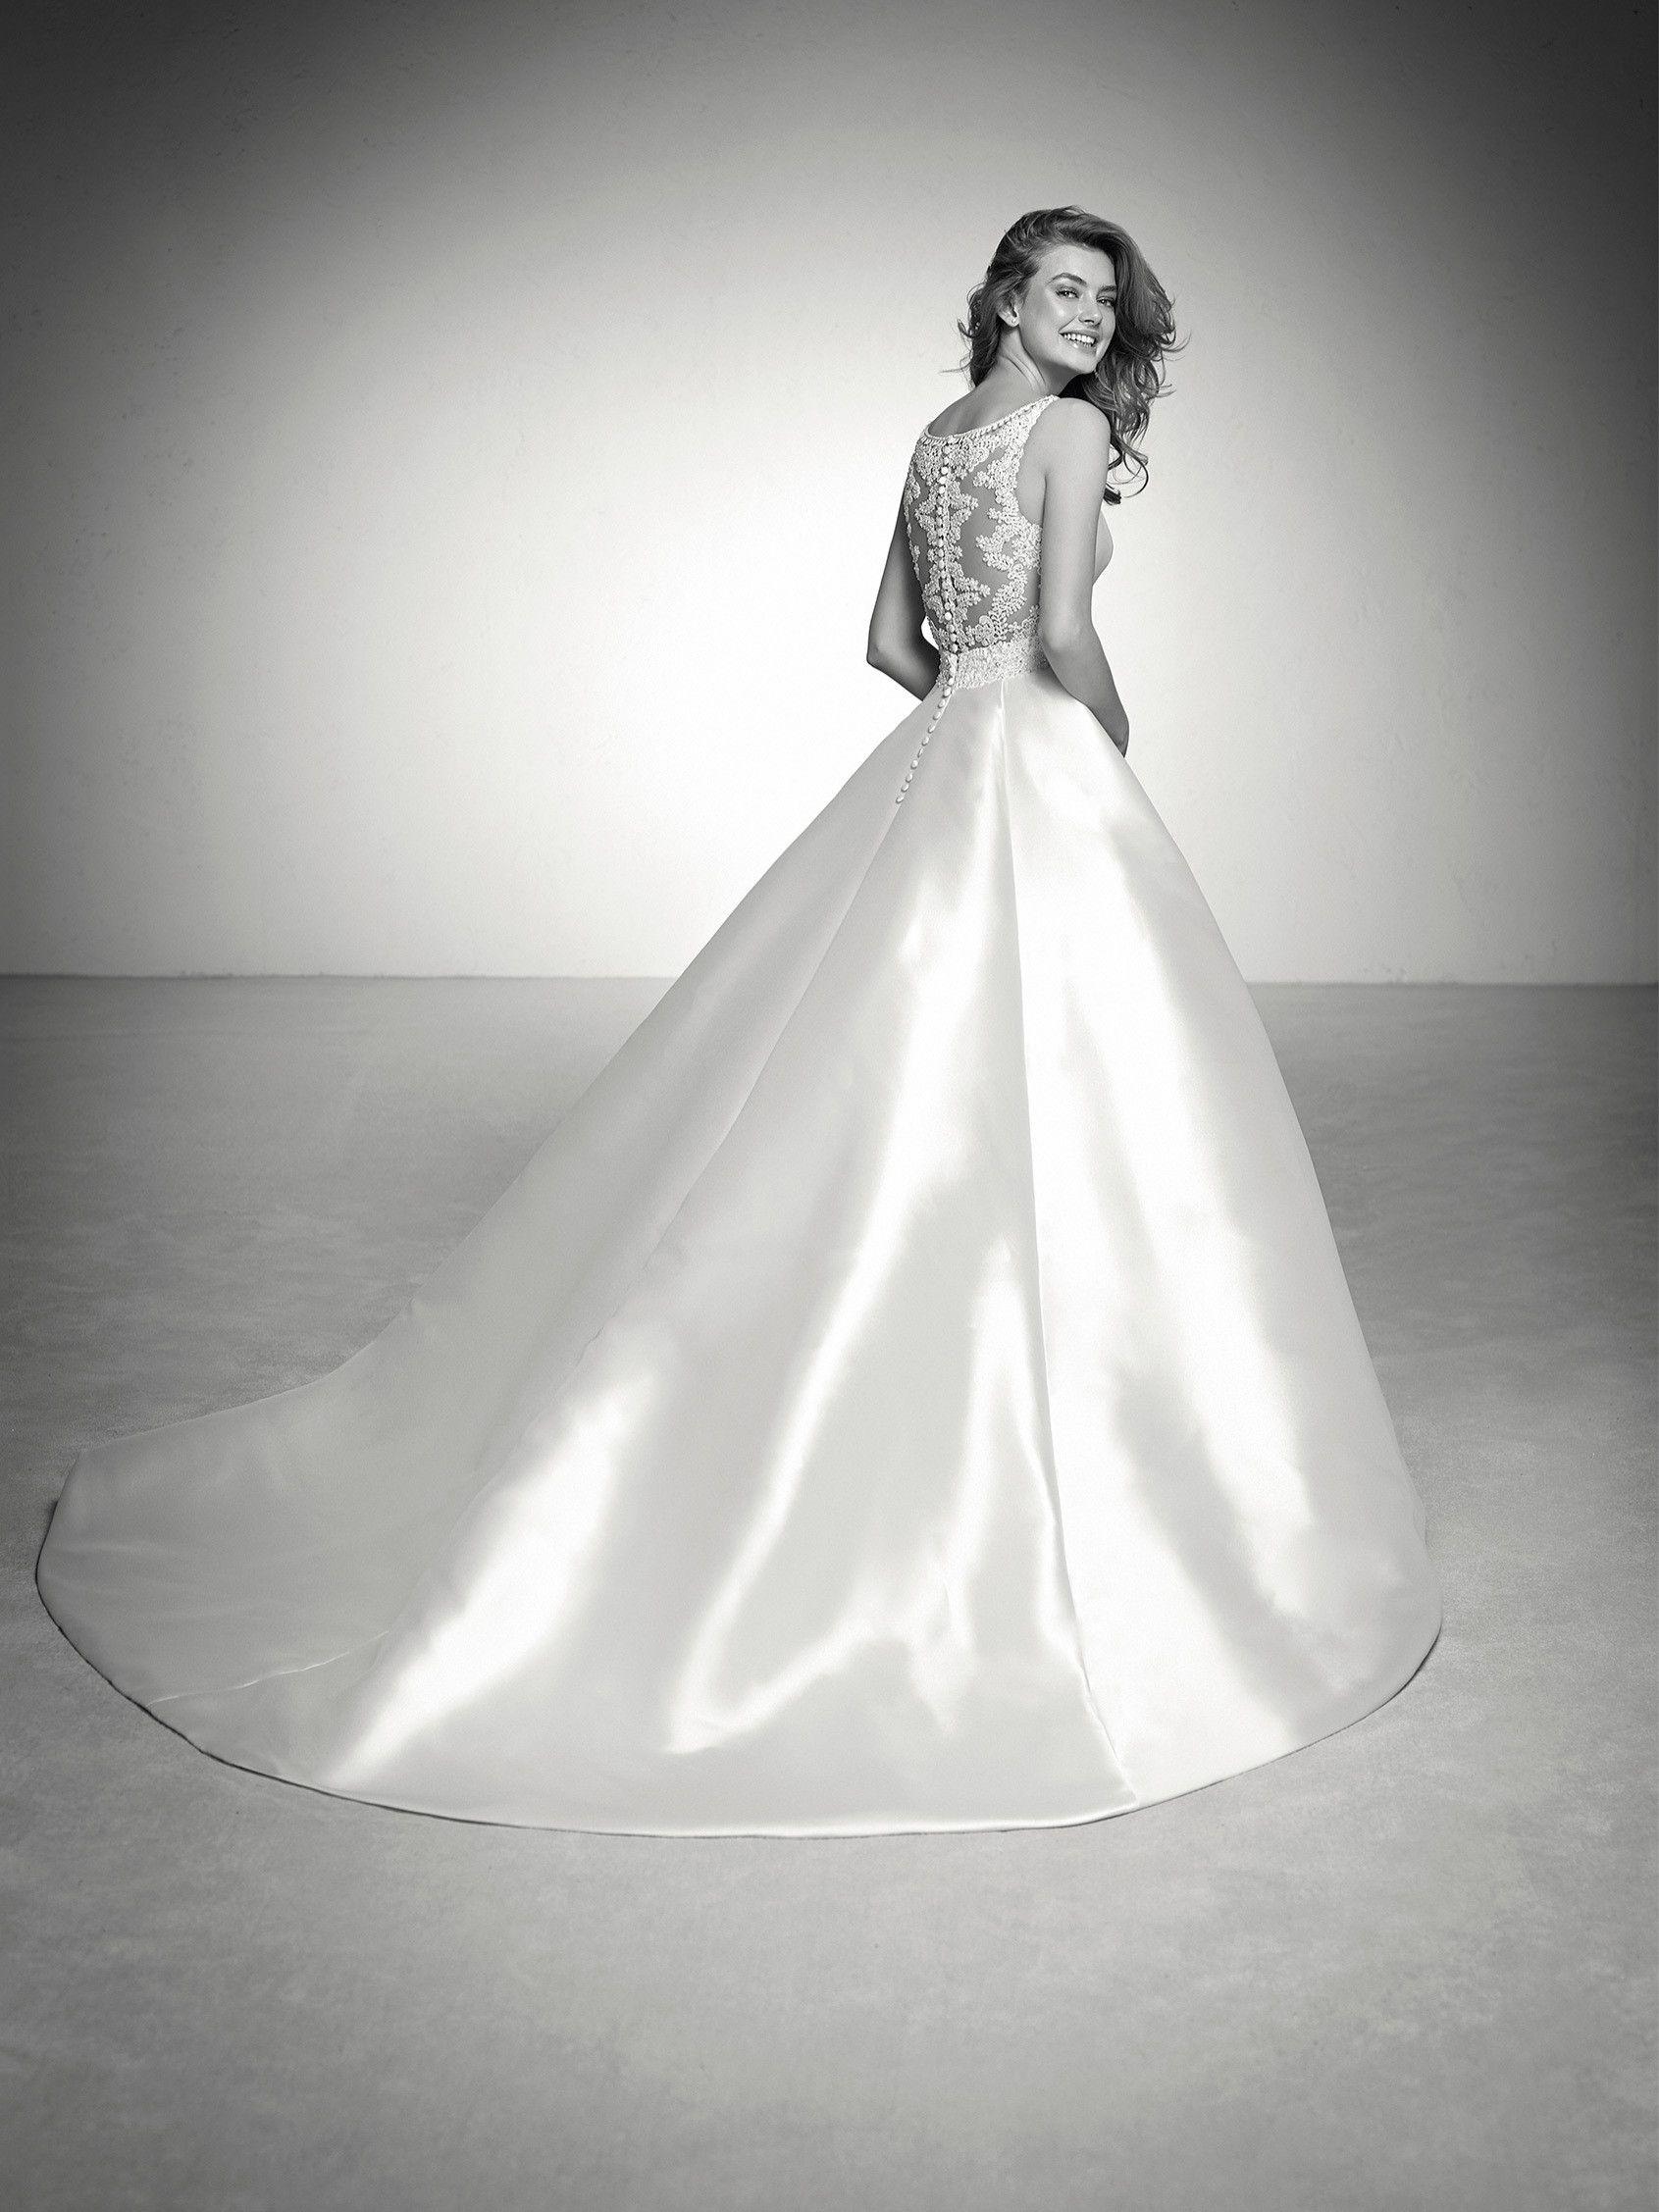 Wedding dress mikado and illusions - Pronovias 2018 Collection ...